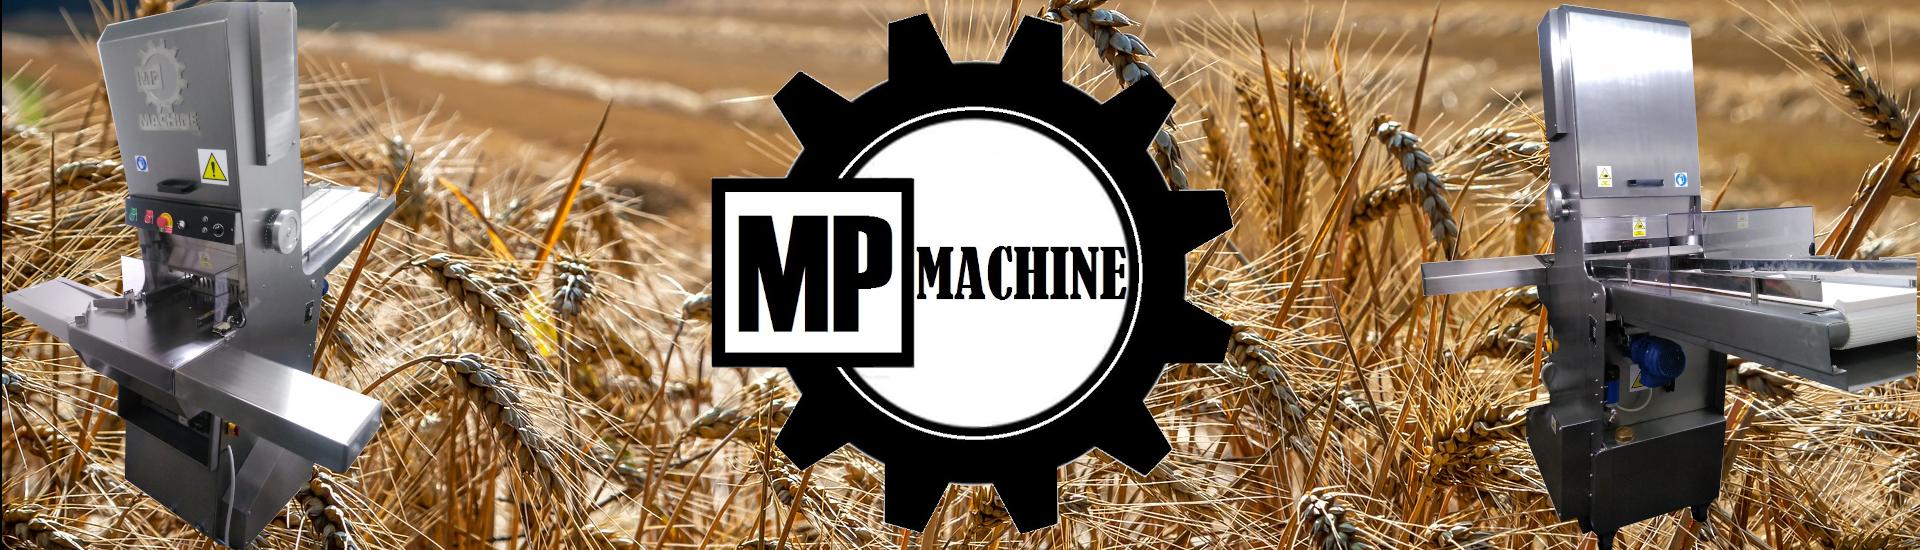 MP-MACHINE